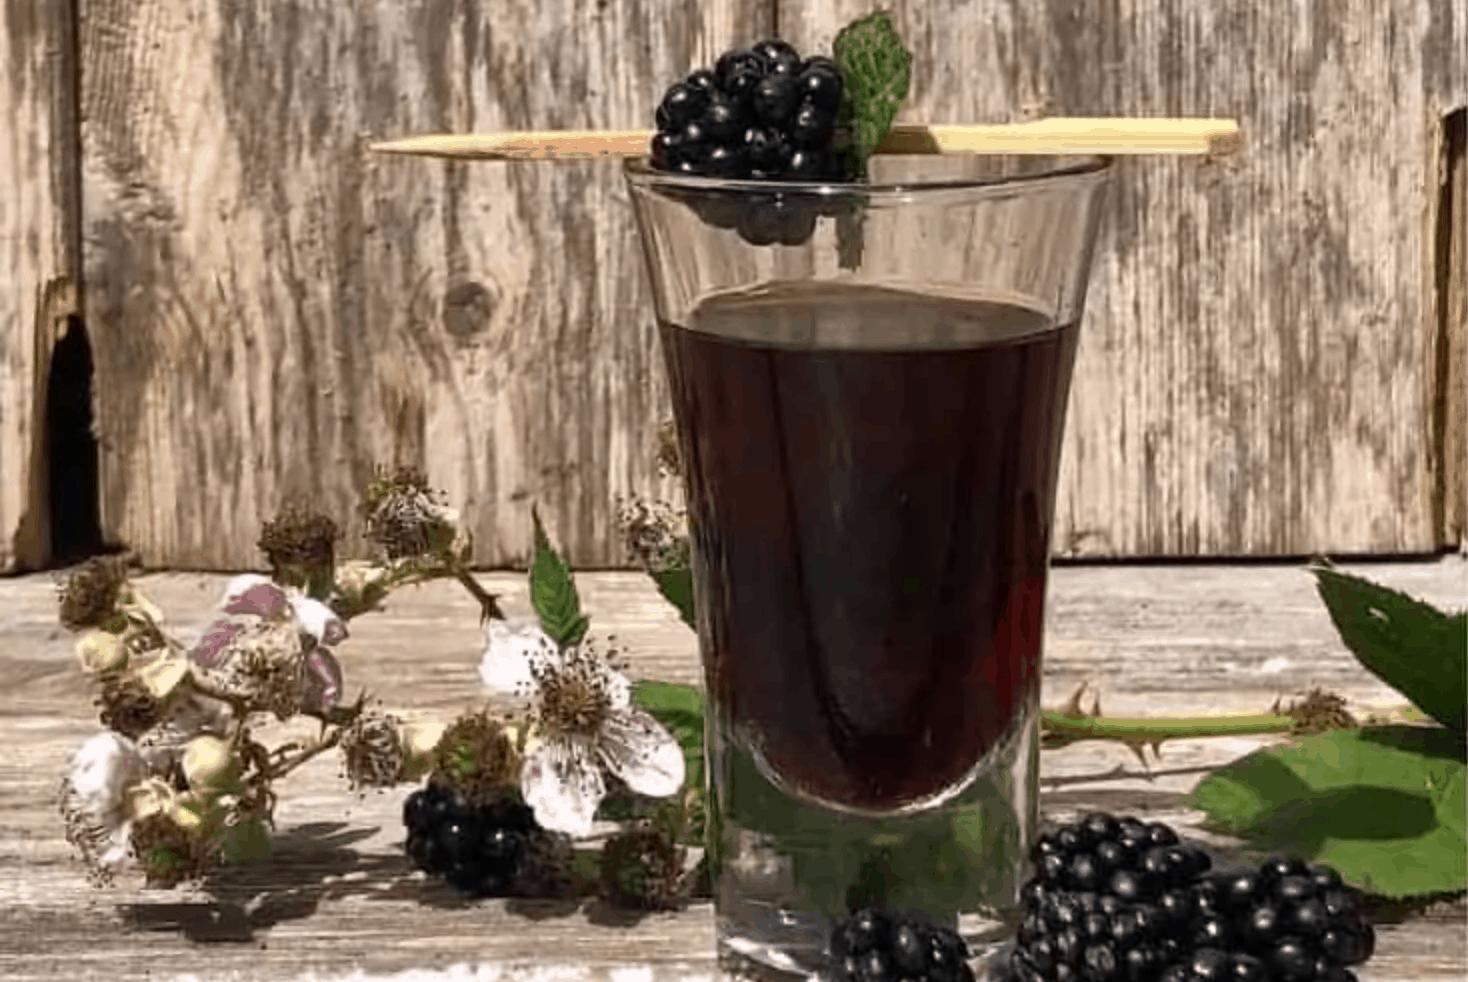 blackberry vodka by The Travelbunny